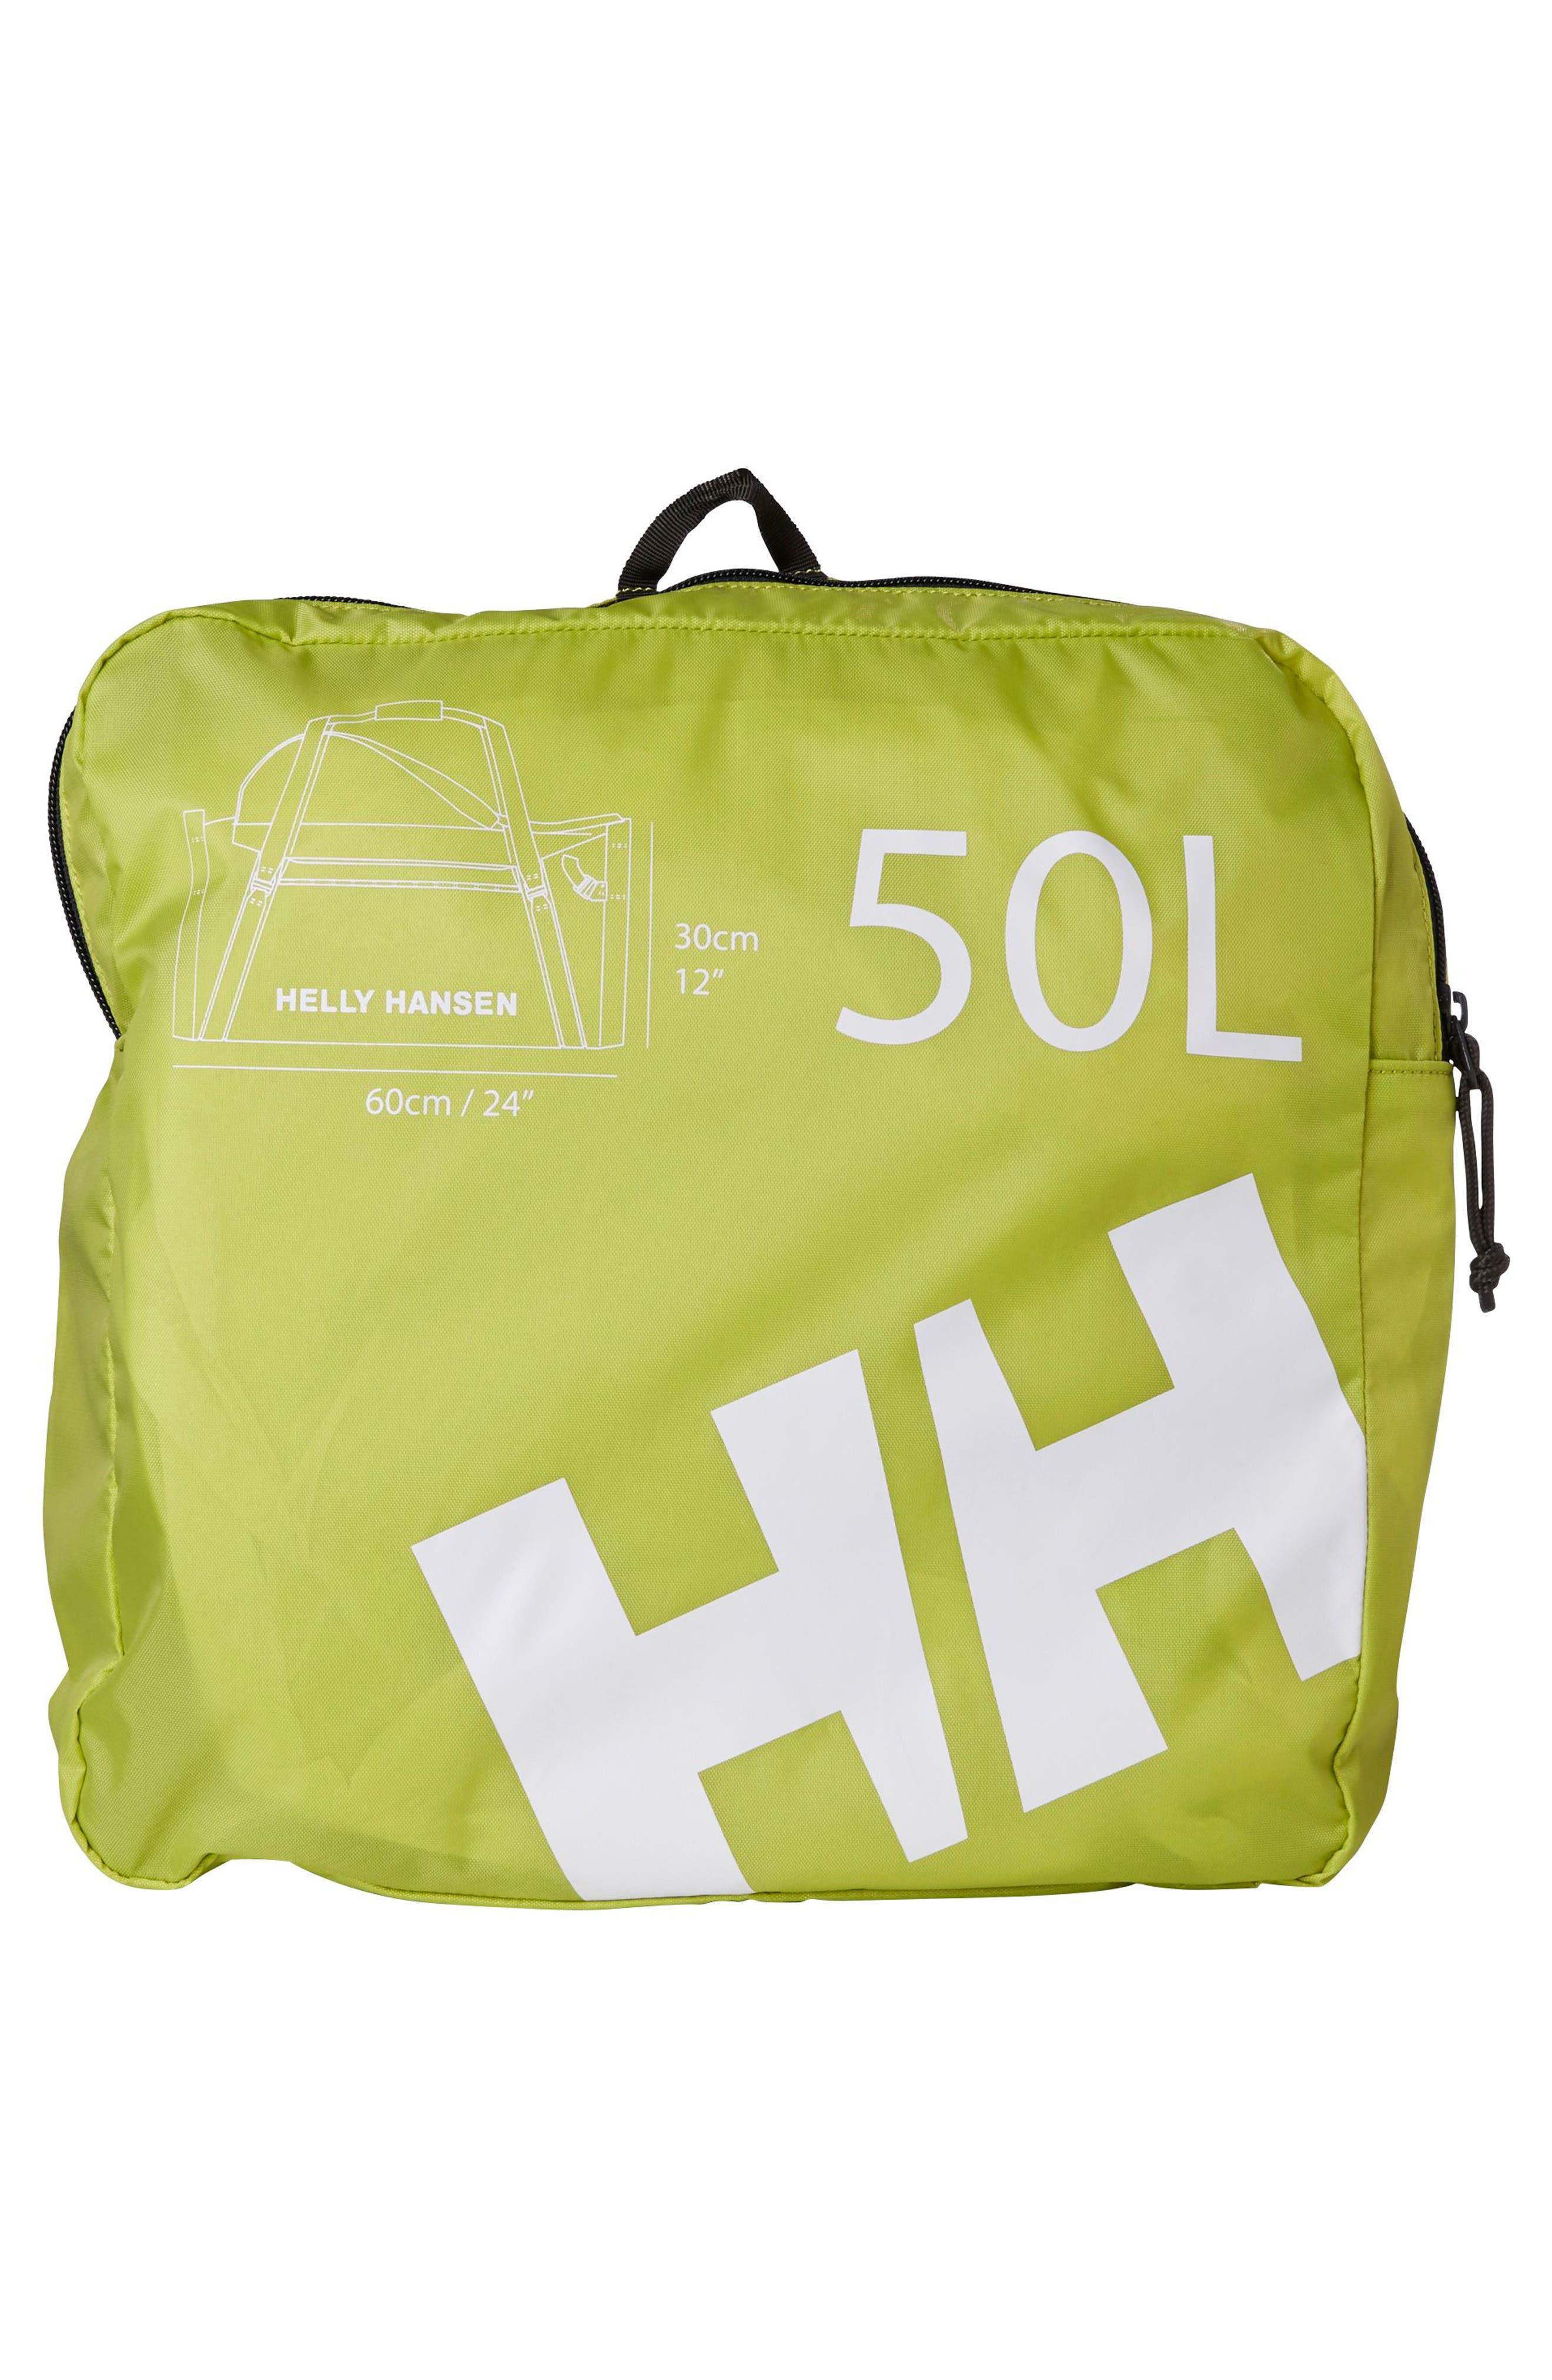 HELLY HANSEN,                             50-Liter Duffel Bag,                             Alternate thumbnail 2, color,                             009